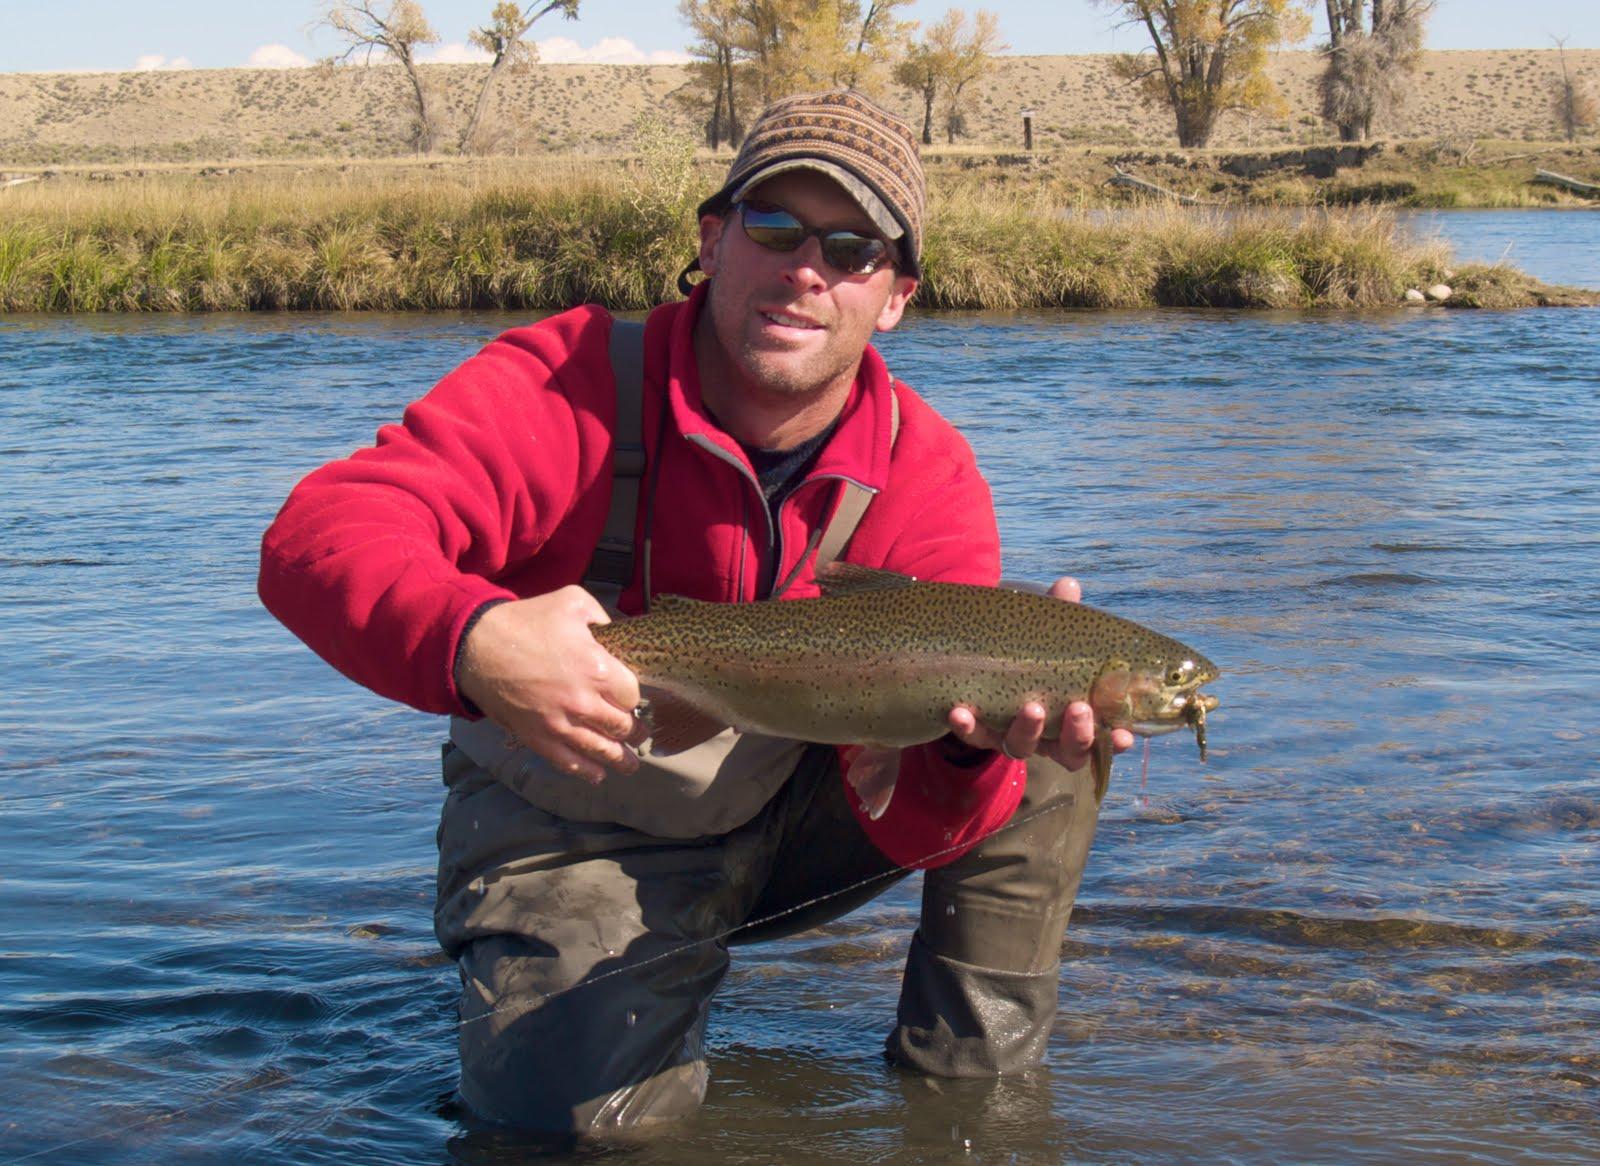 Farewell to the 2010 fishing season for Pa fishing season